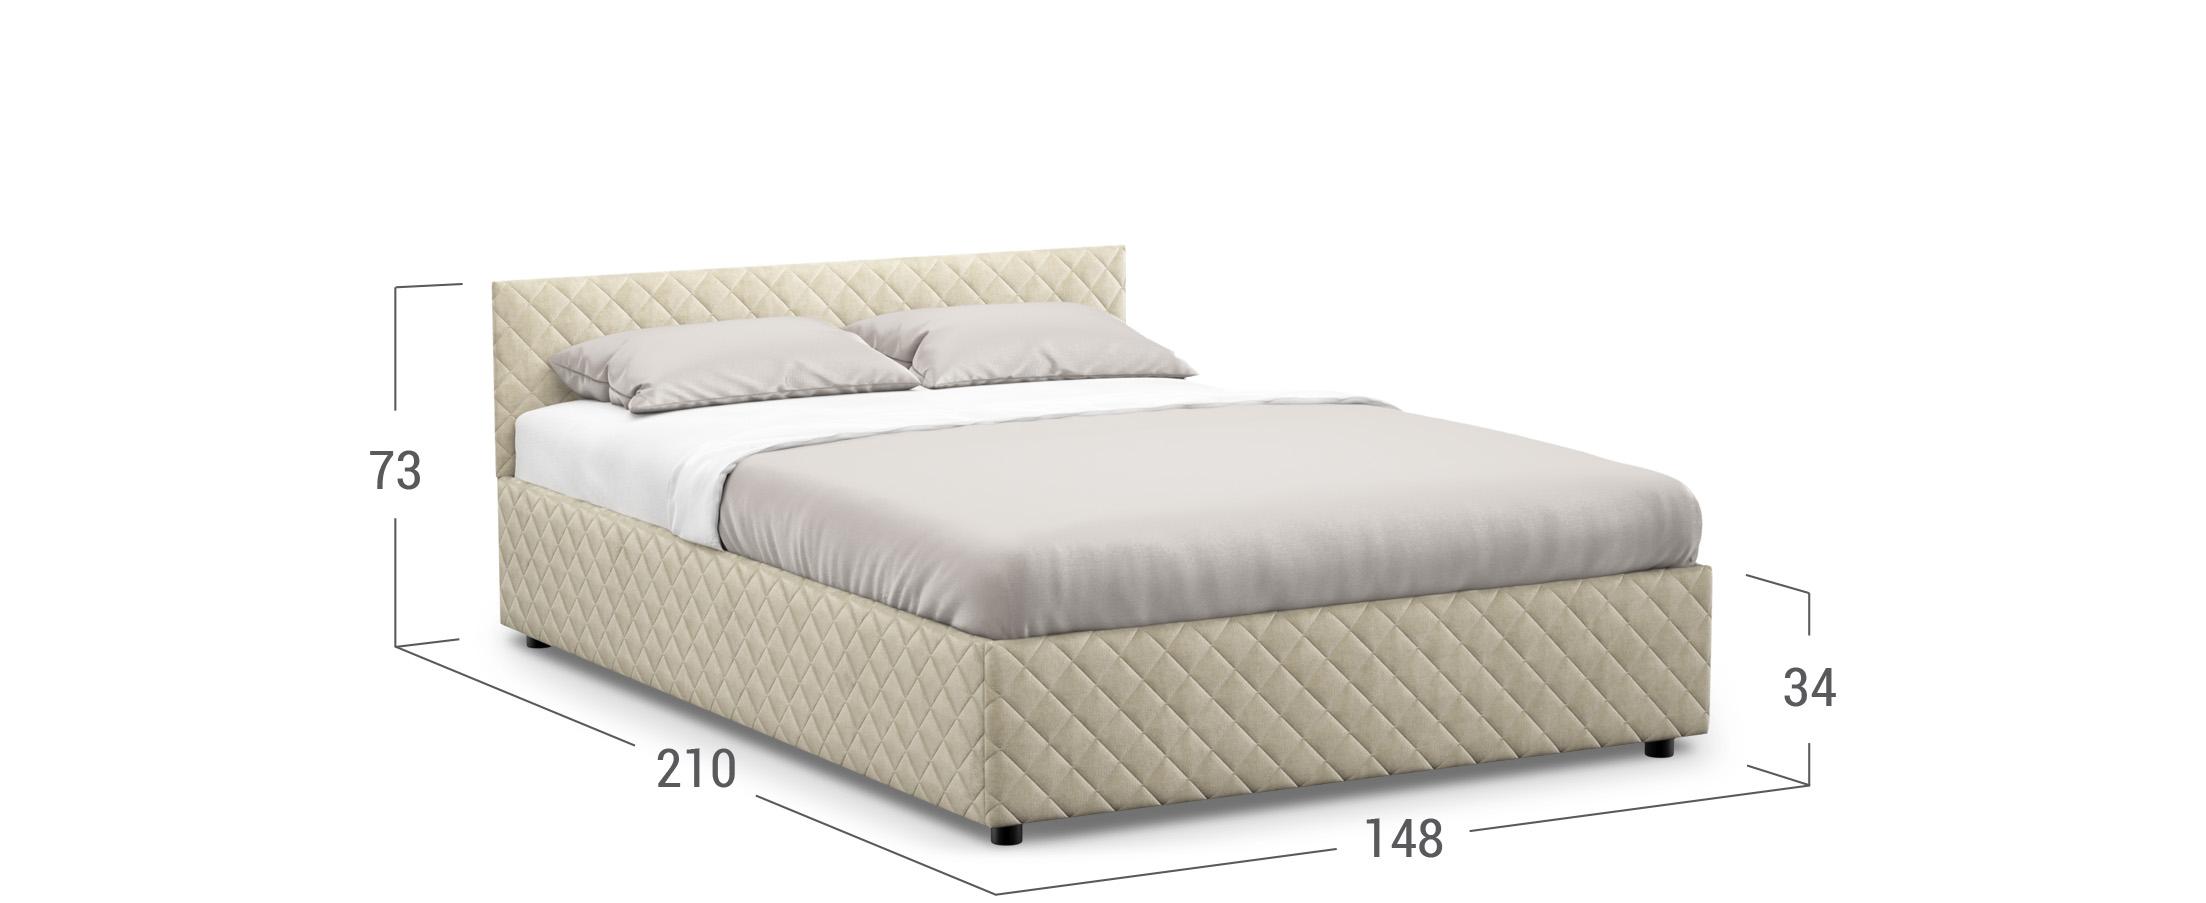 Кровать двуспальная Prima Style New 140х200 Модель 1221